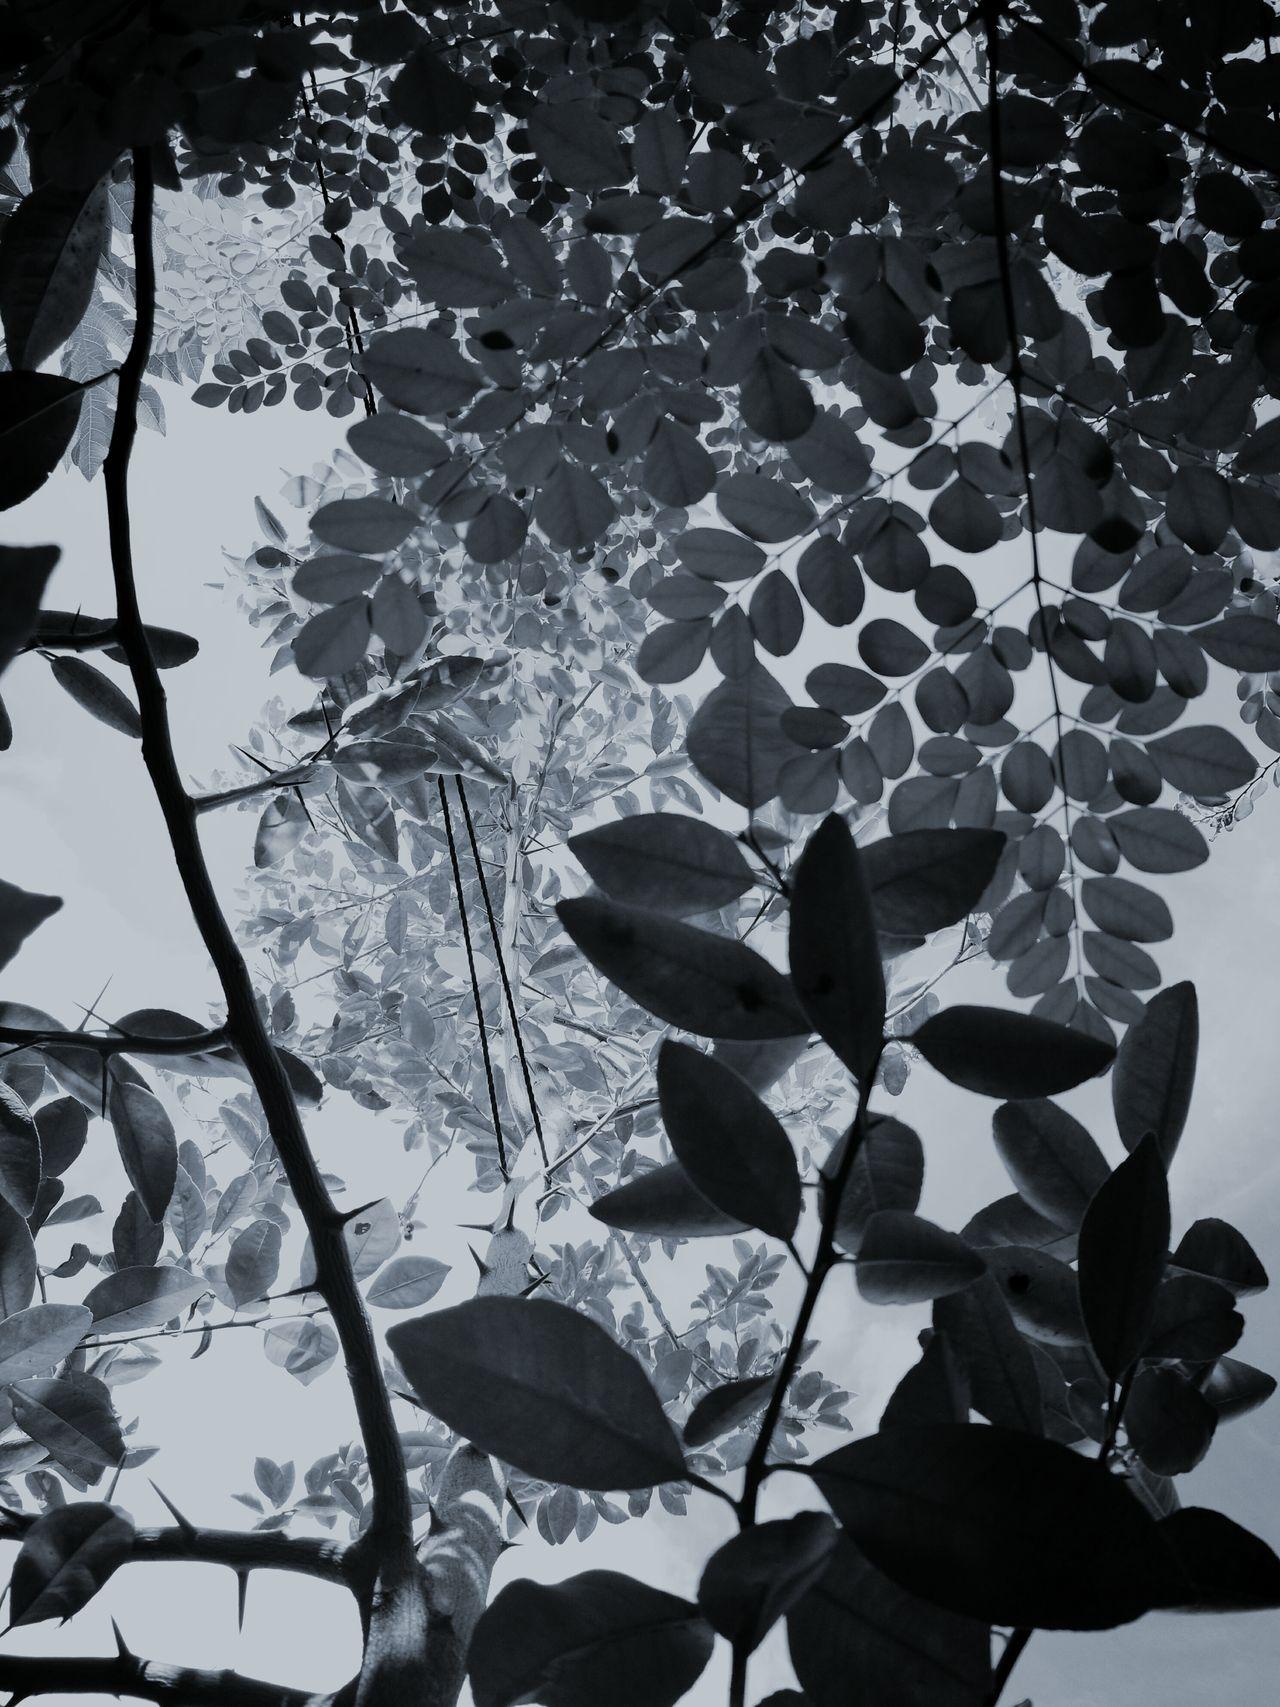 Freshness Branch First Eyeem Photo Black & White Foliage, Vegetation, Plants, Green, Leaves, Leafage, Undergrowth, Underbrush, Plant Life, Flora